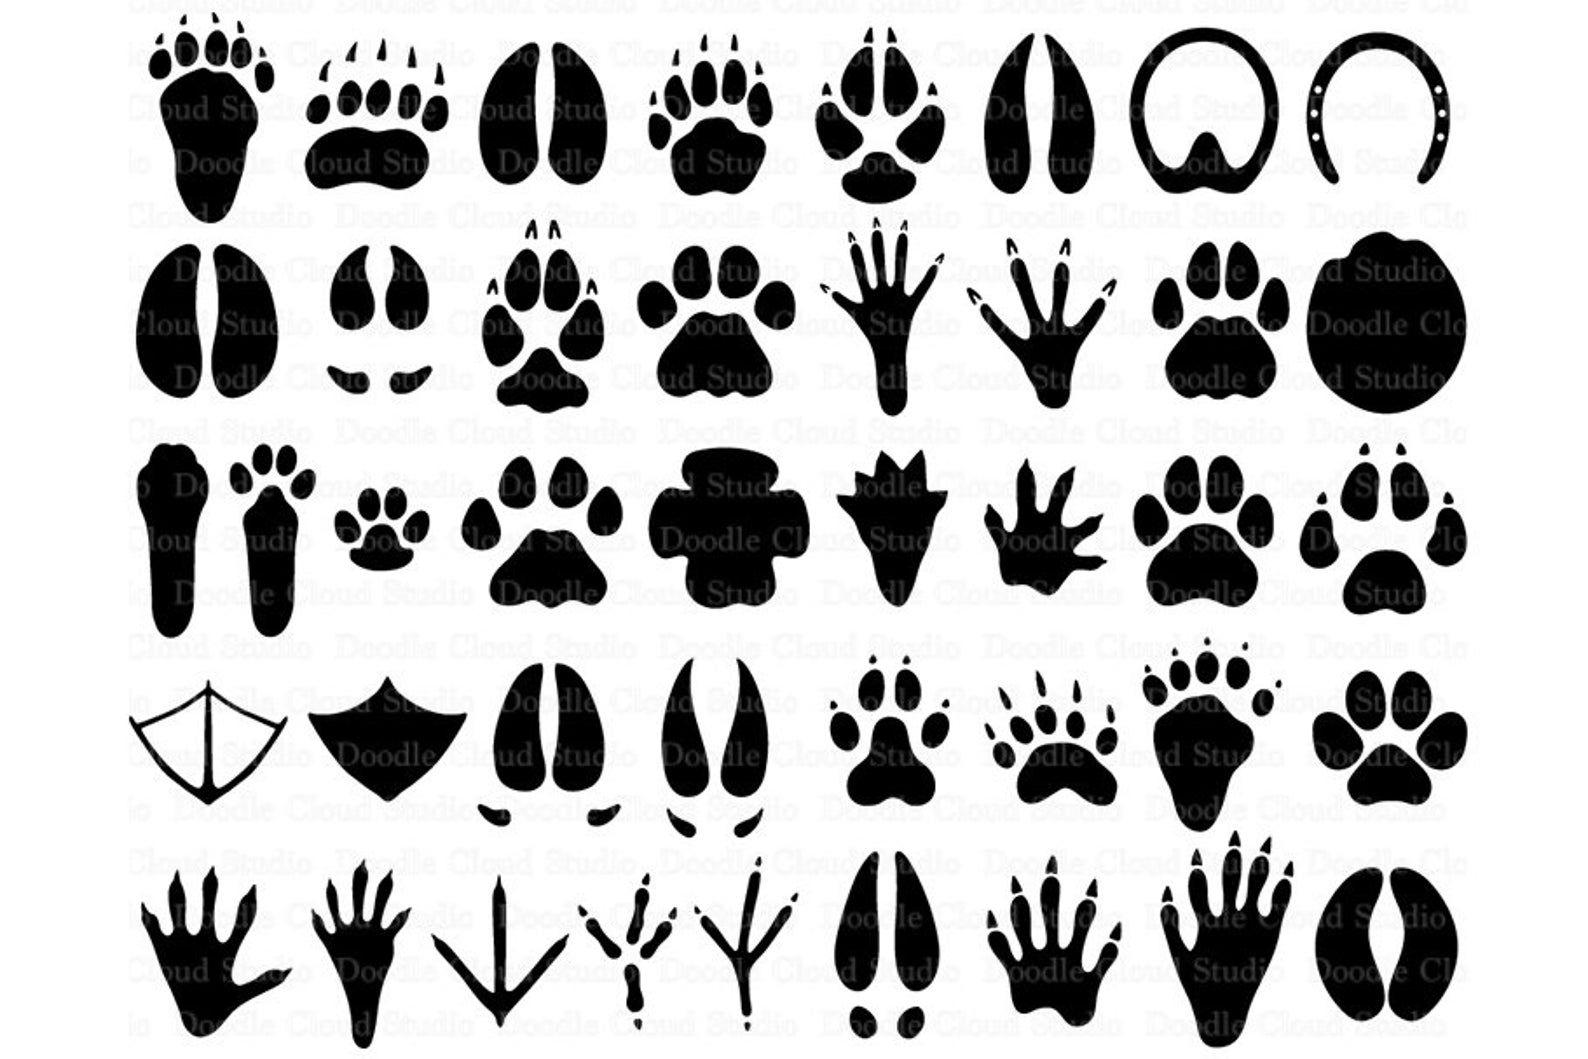 31 Animal Paw Svg Paw Prints Svg Files For Silhouette Cameo Etsy Animal Tracks Paw Print Clip Art